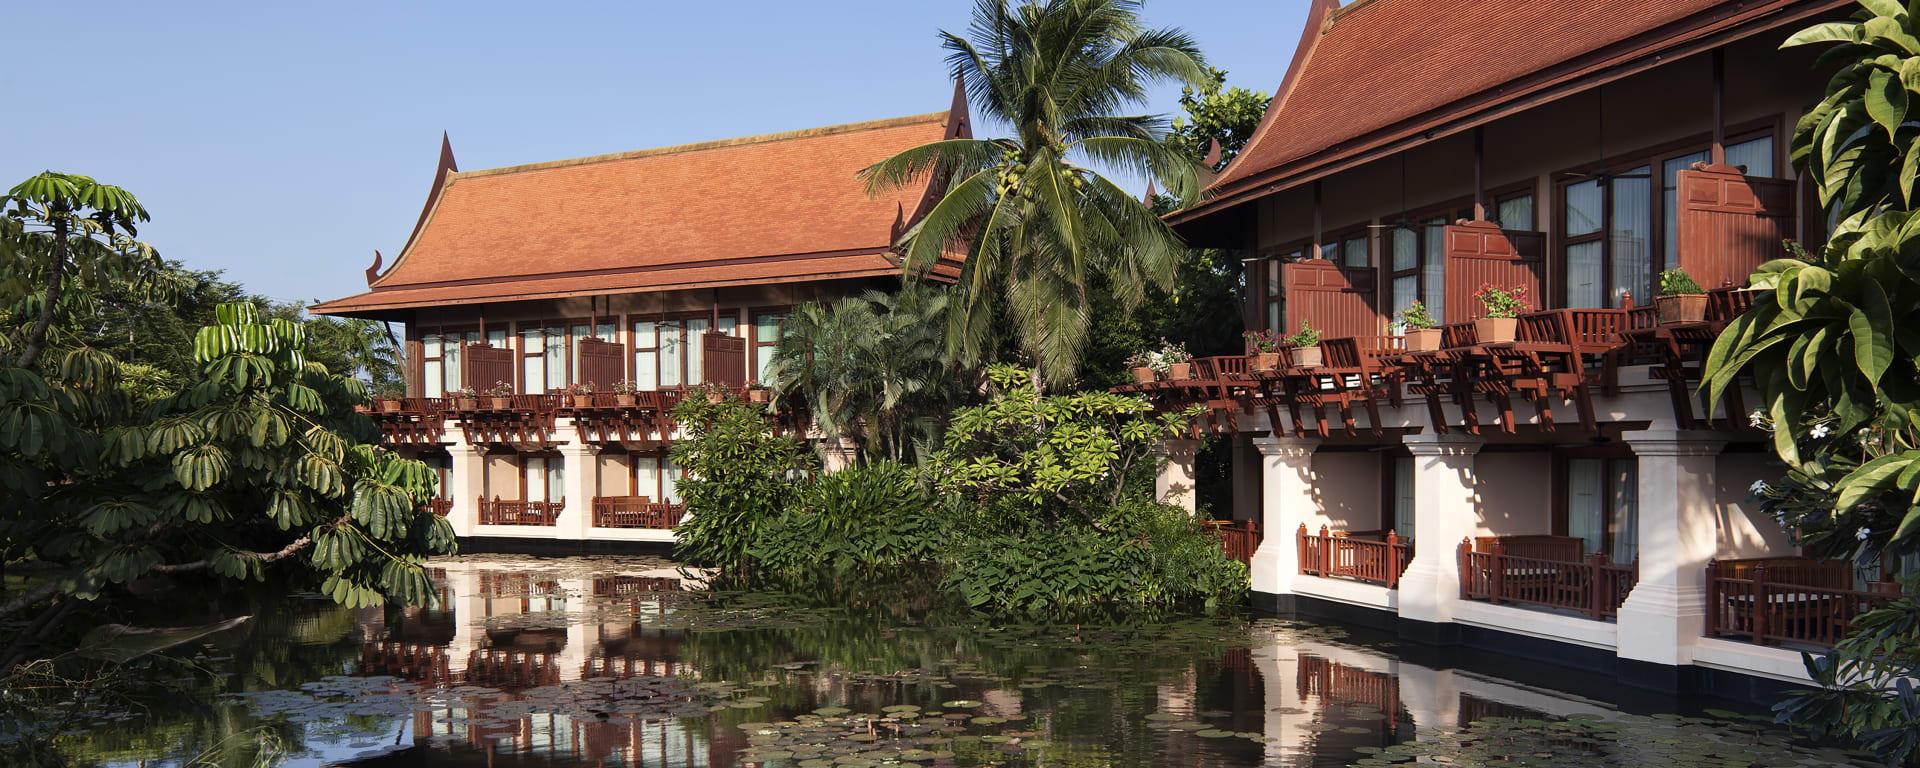 Anantara Hua Hin Resort: Thailand Anantara Hua Hin Resort Lagune